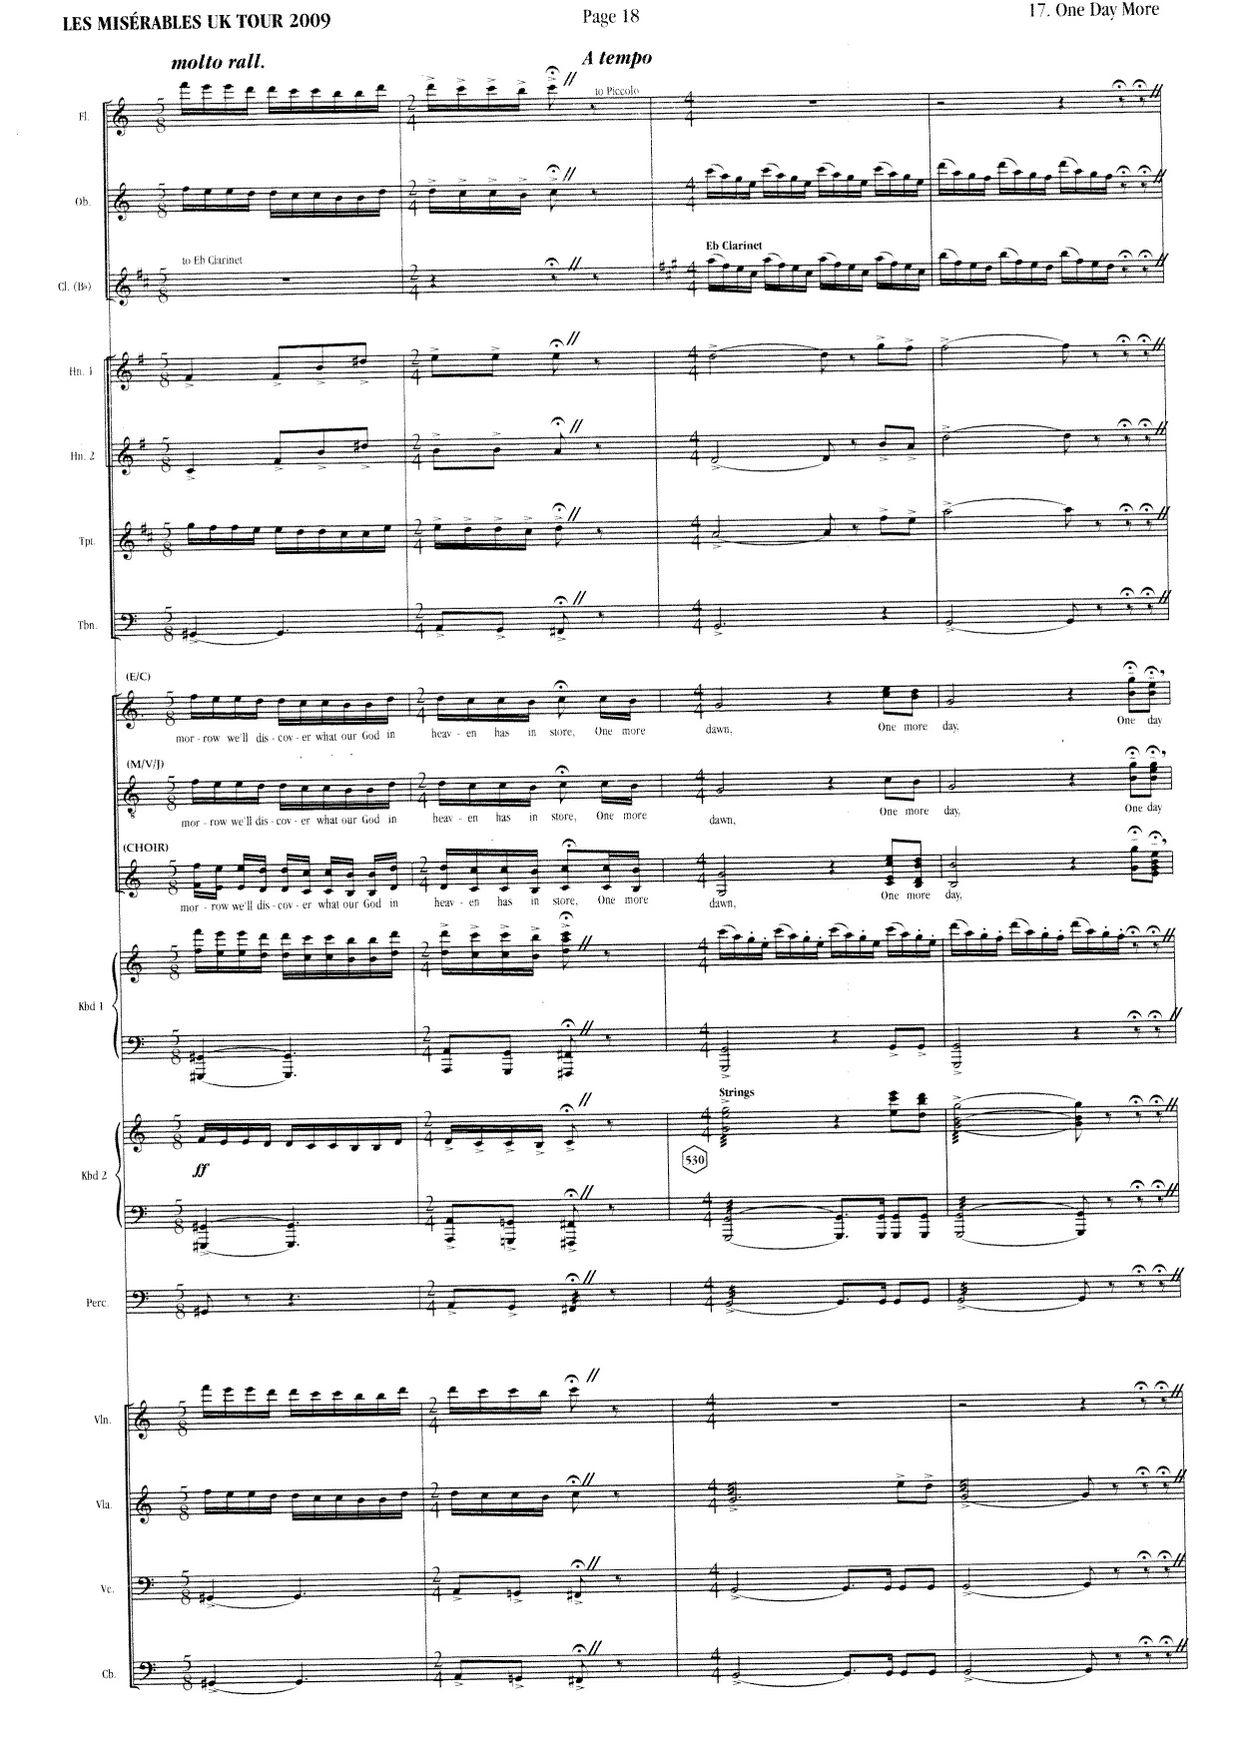 les miserables full orchestral score pdf